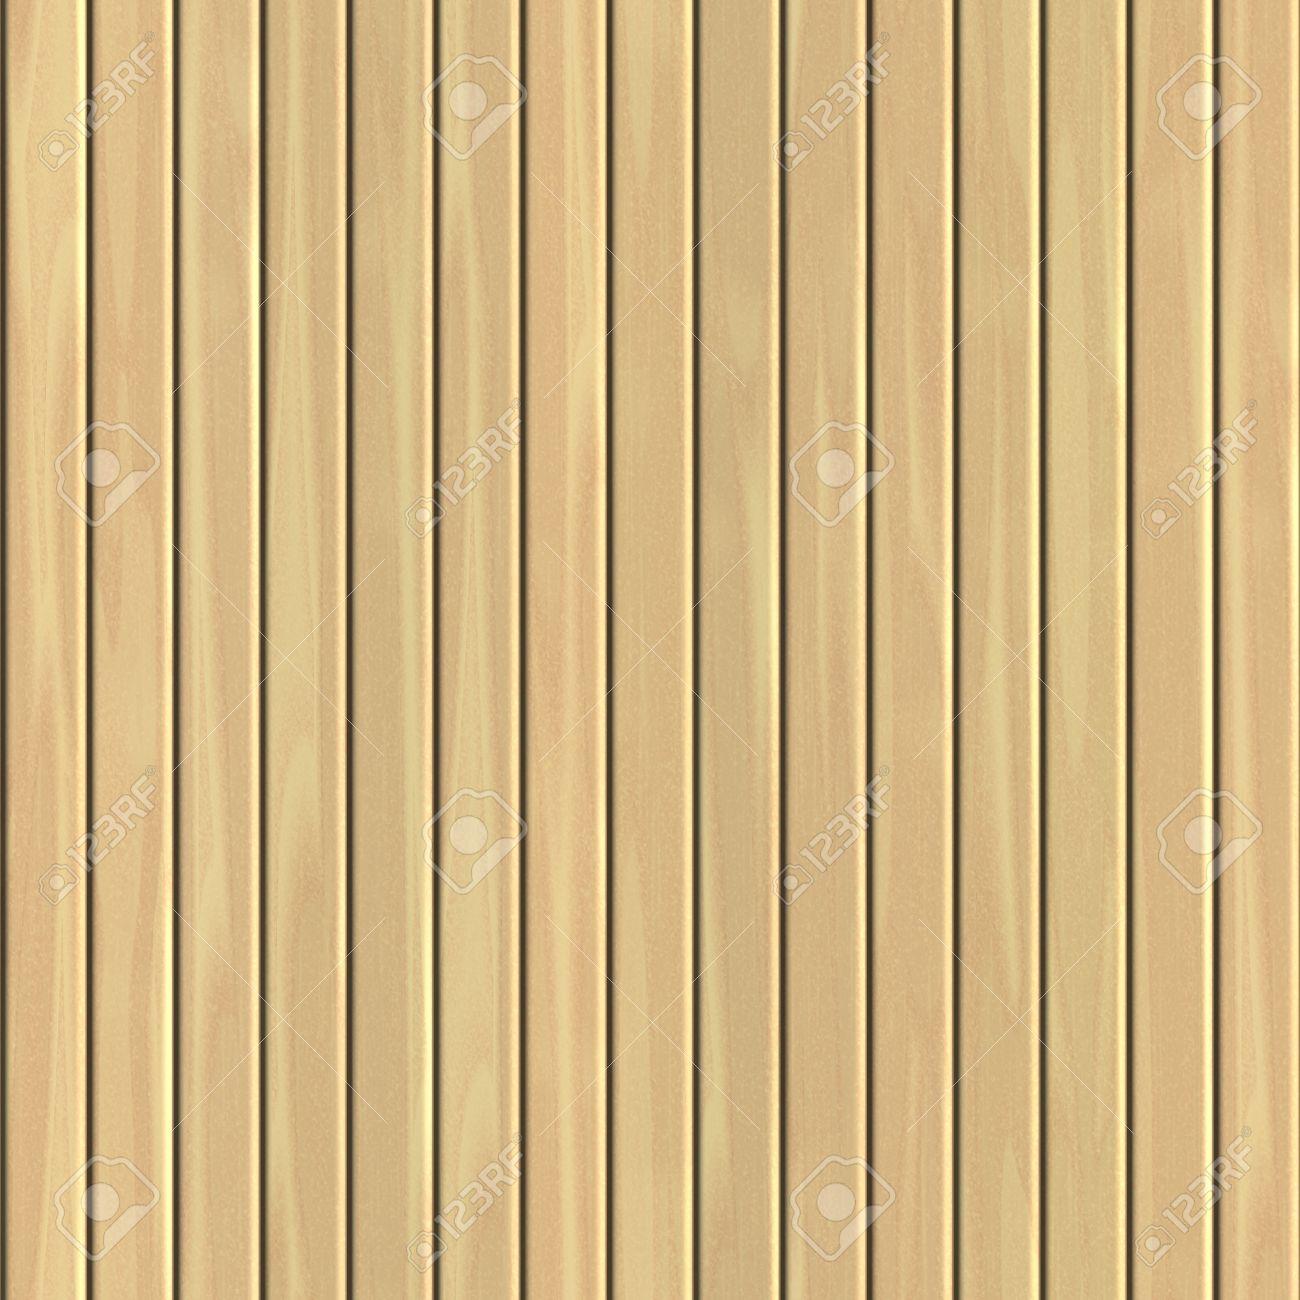 wood plank texture seamless. Wood Plank. Seamless Texture. Stock Photo - 18783449 Plank Texture L